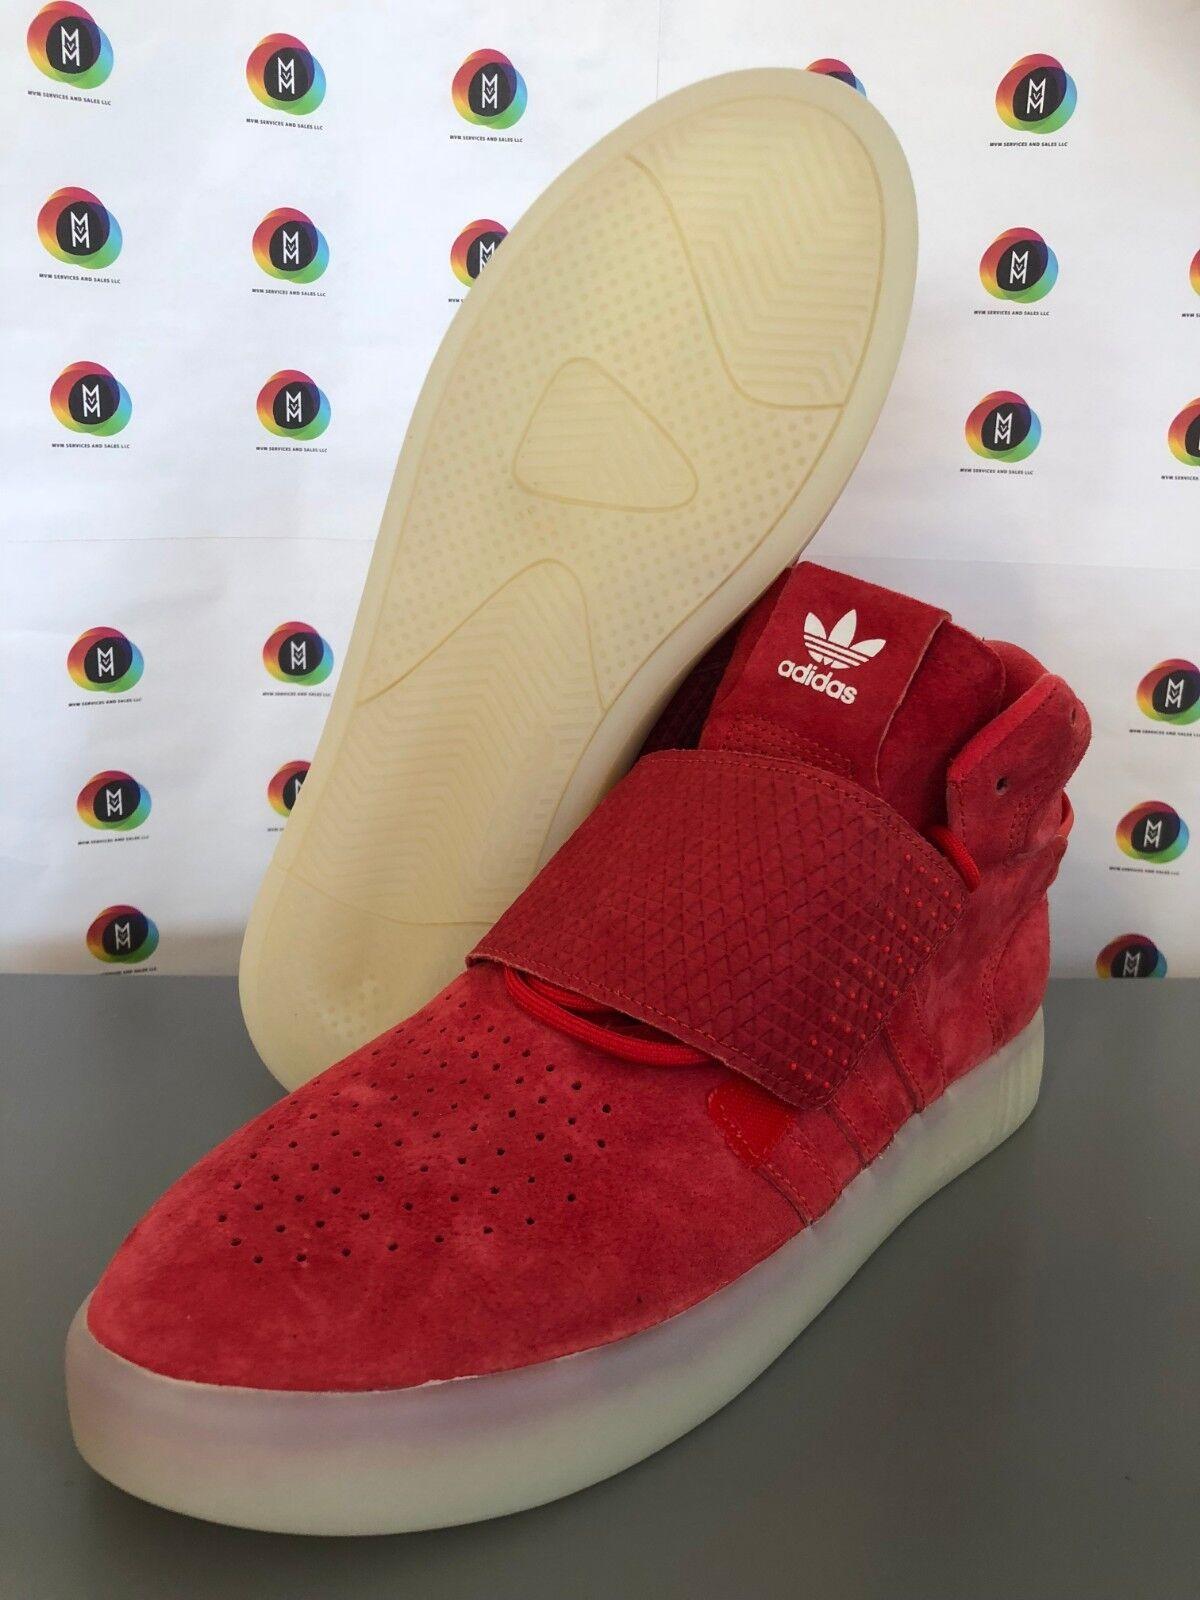 Adidas Originals Tubular Invader Strap Red Mens BB5039 Suede Sneakers